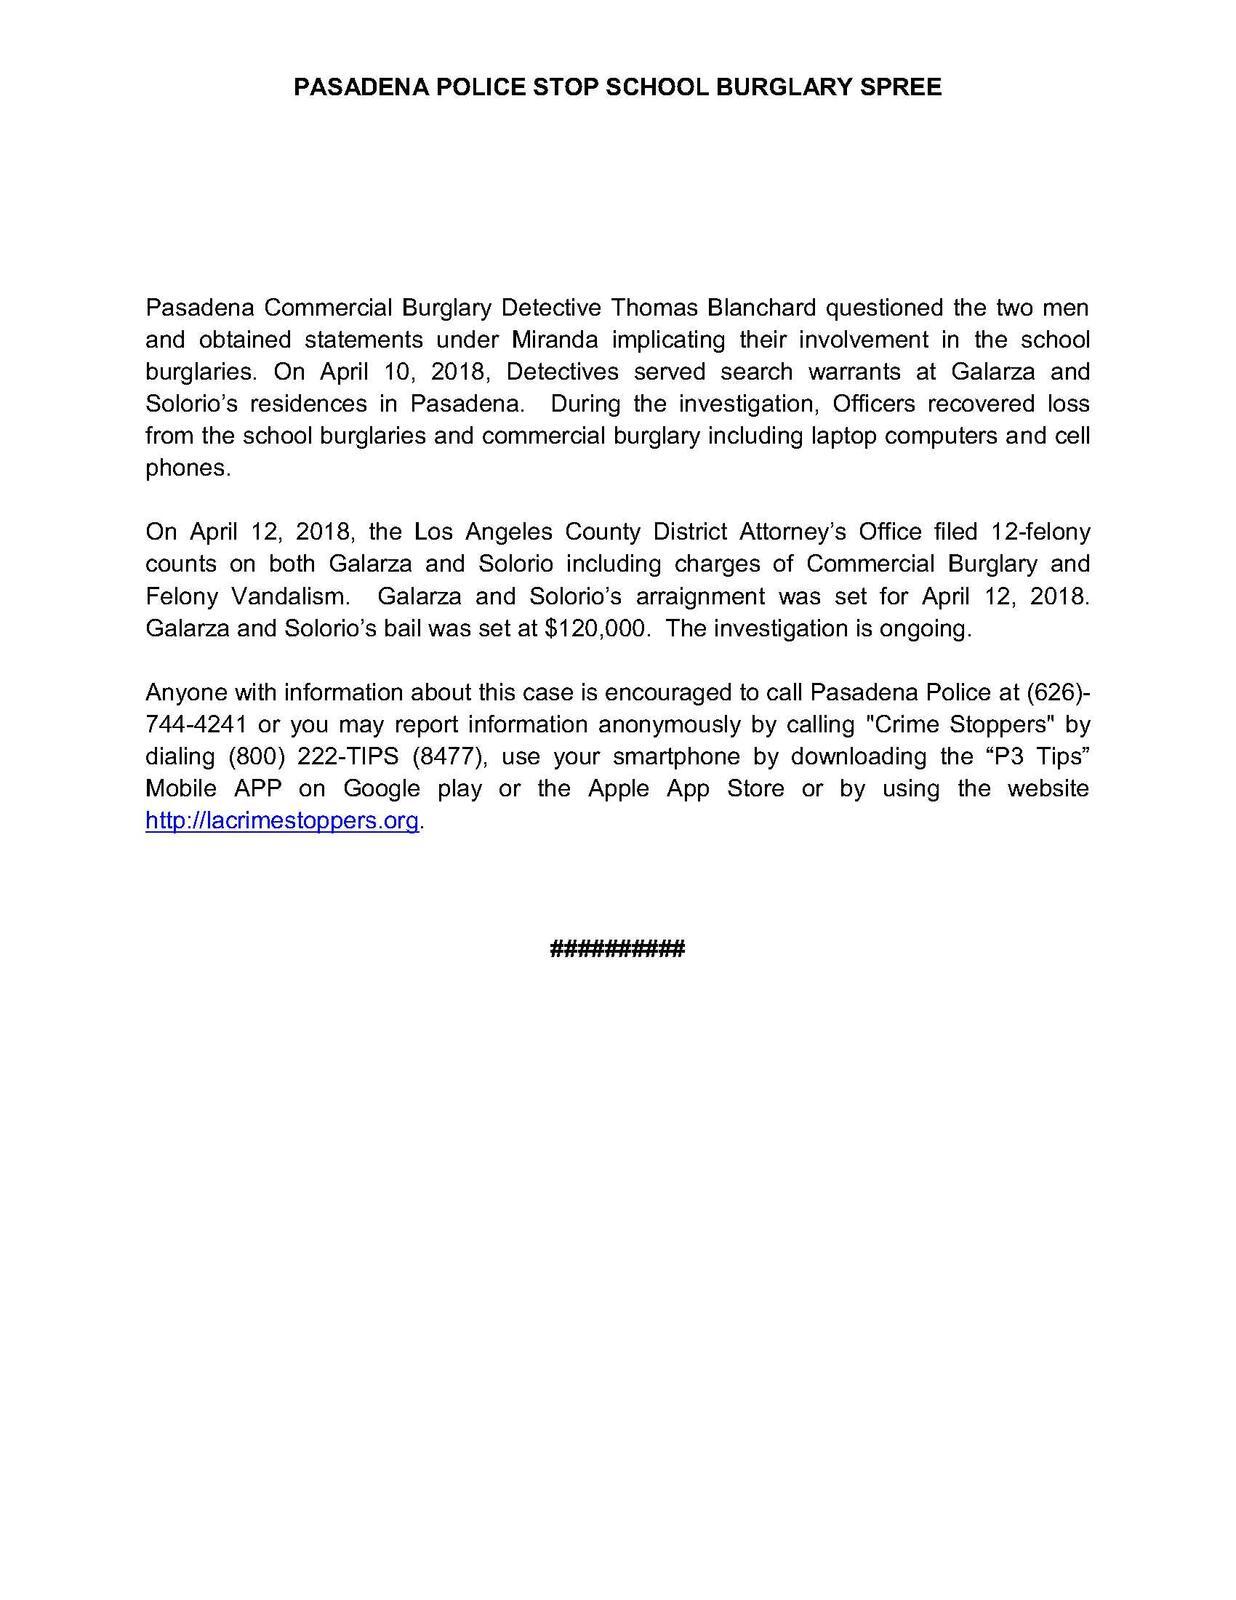 NEWS RELEASE: PASADENA POLICE STOP SCHOOL BURGLARY SPREE (Pasadena